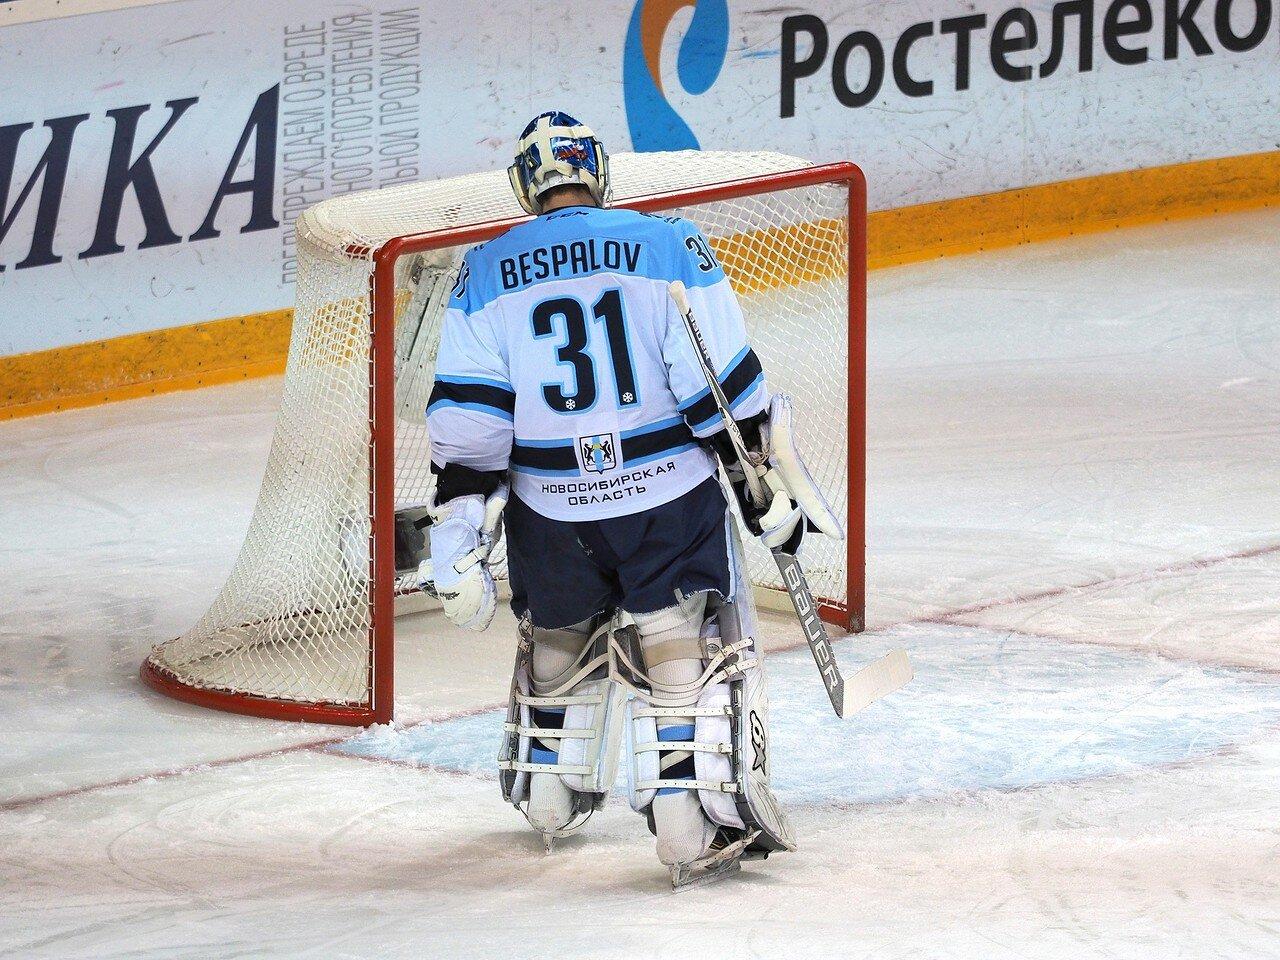 47Плей-офф 2016 Восток 1/2 Металлург - Сибирь 16.03.2016